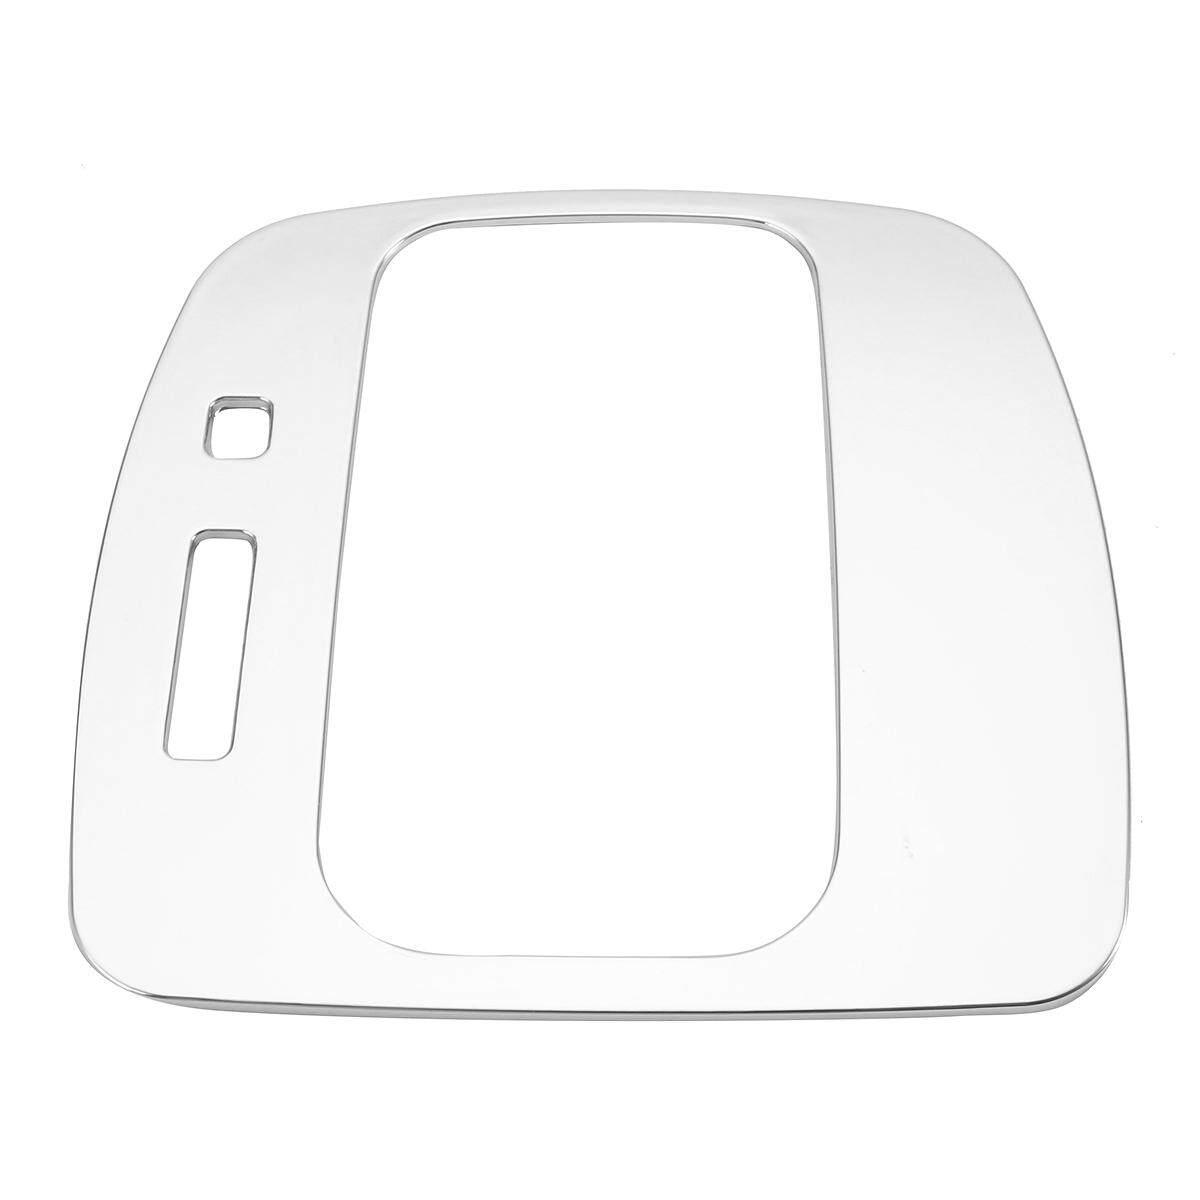 Cocok untuk 13-Ford Escape KUGA Chrome Gear Shift Kotak Pangkasan Penutup Panel Bingkai Bezel